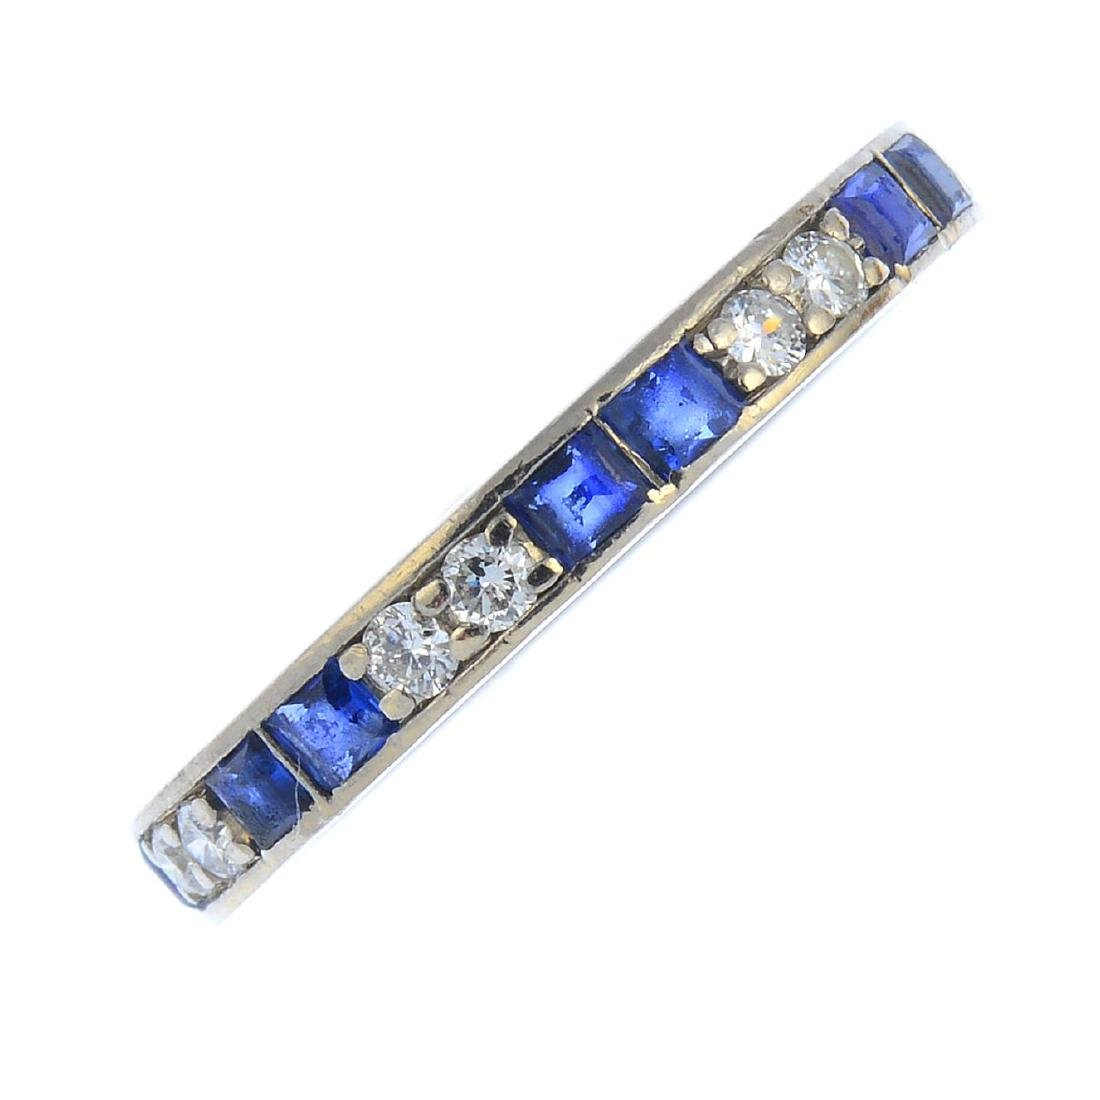 A mid 20th century sapphire and diamond full eternity